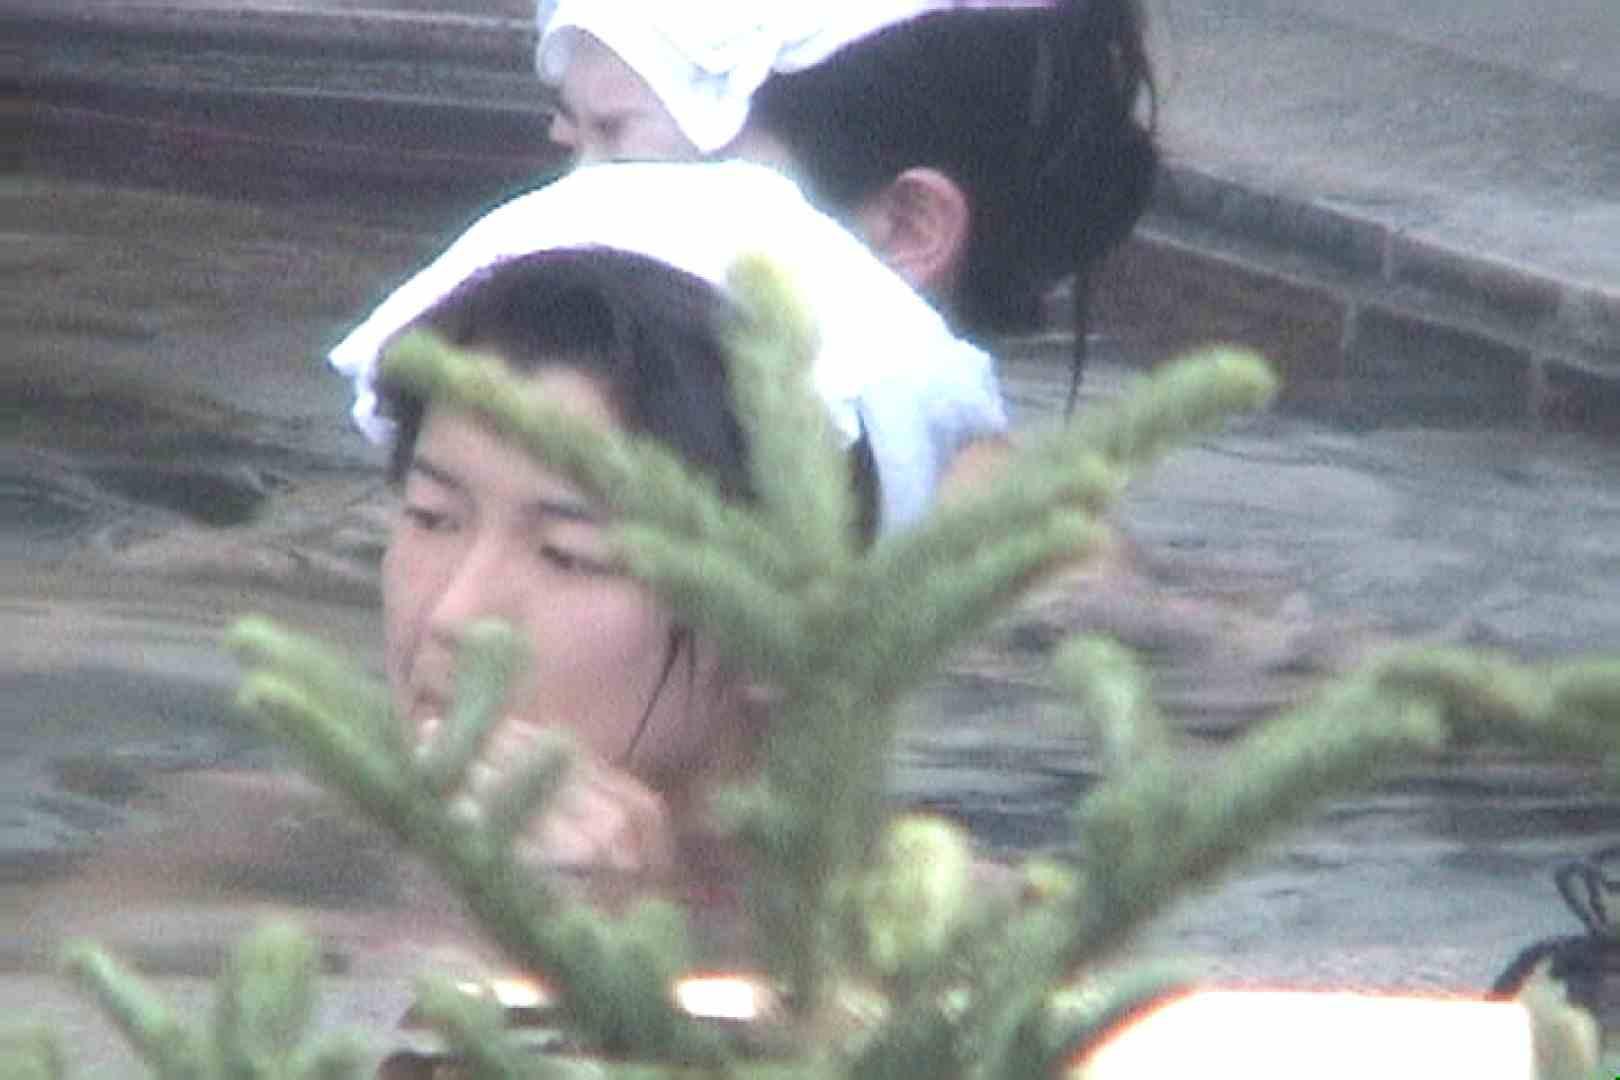 Aquaな露天風呂Vol.80【VIP限定】 露天風呂編   盗撮シリーズ  76PIX 67